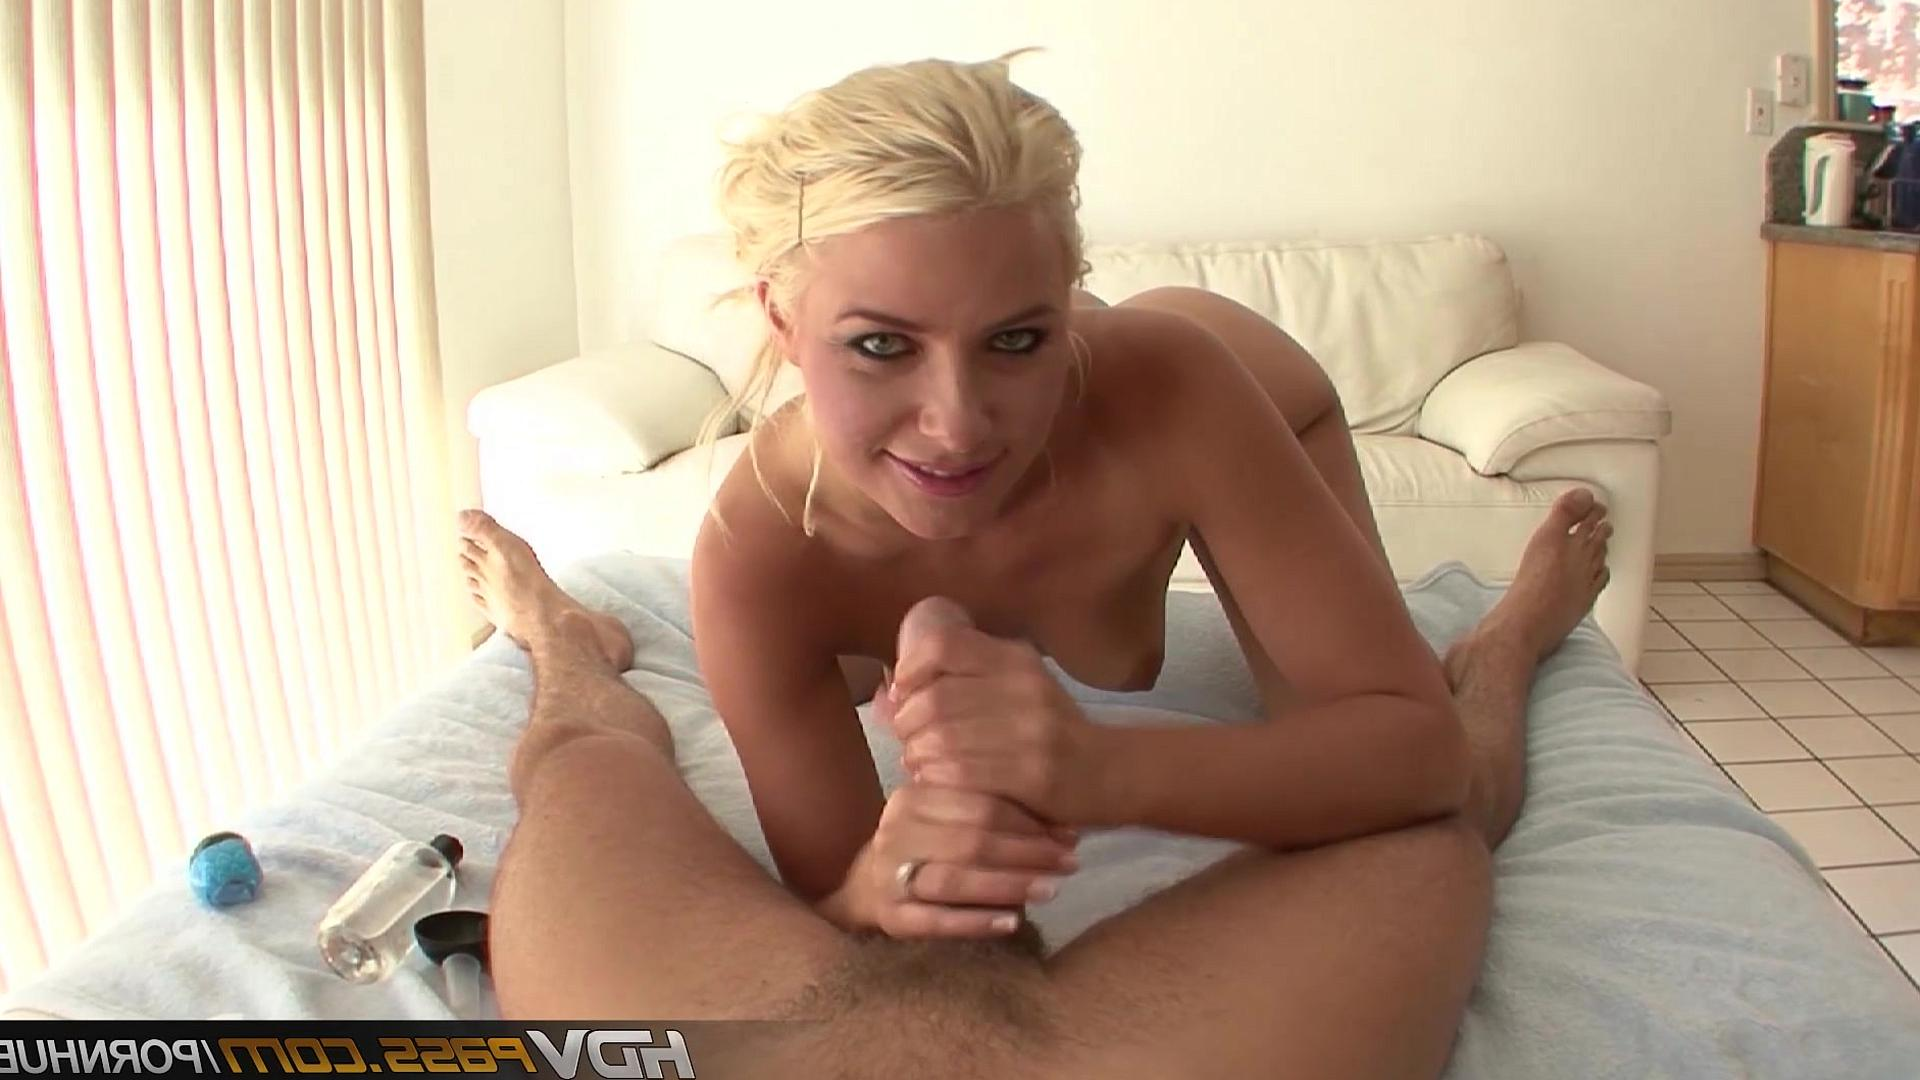 видео онлайн девушка дрочит члнен рукой